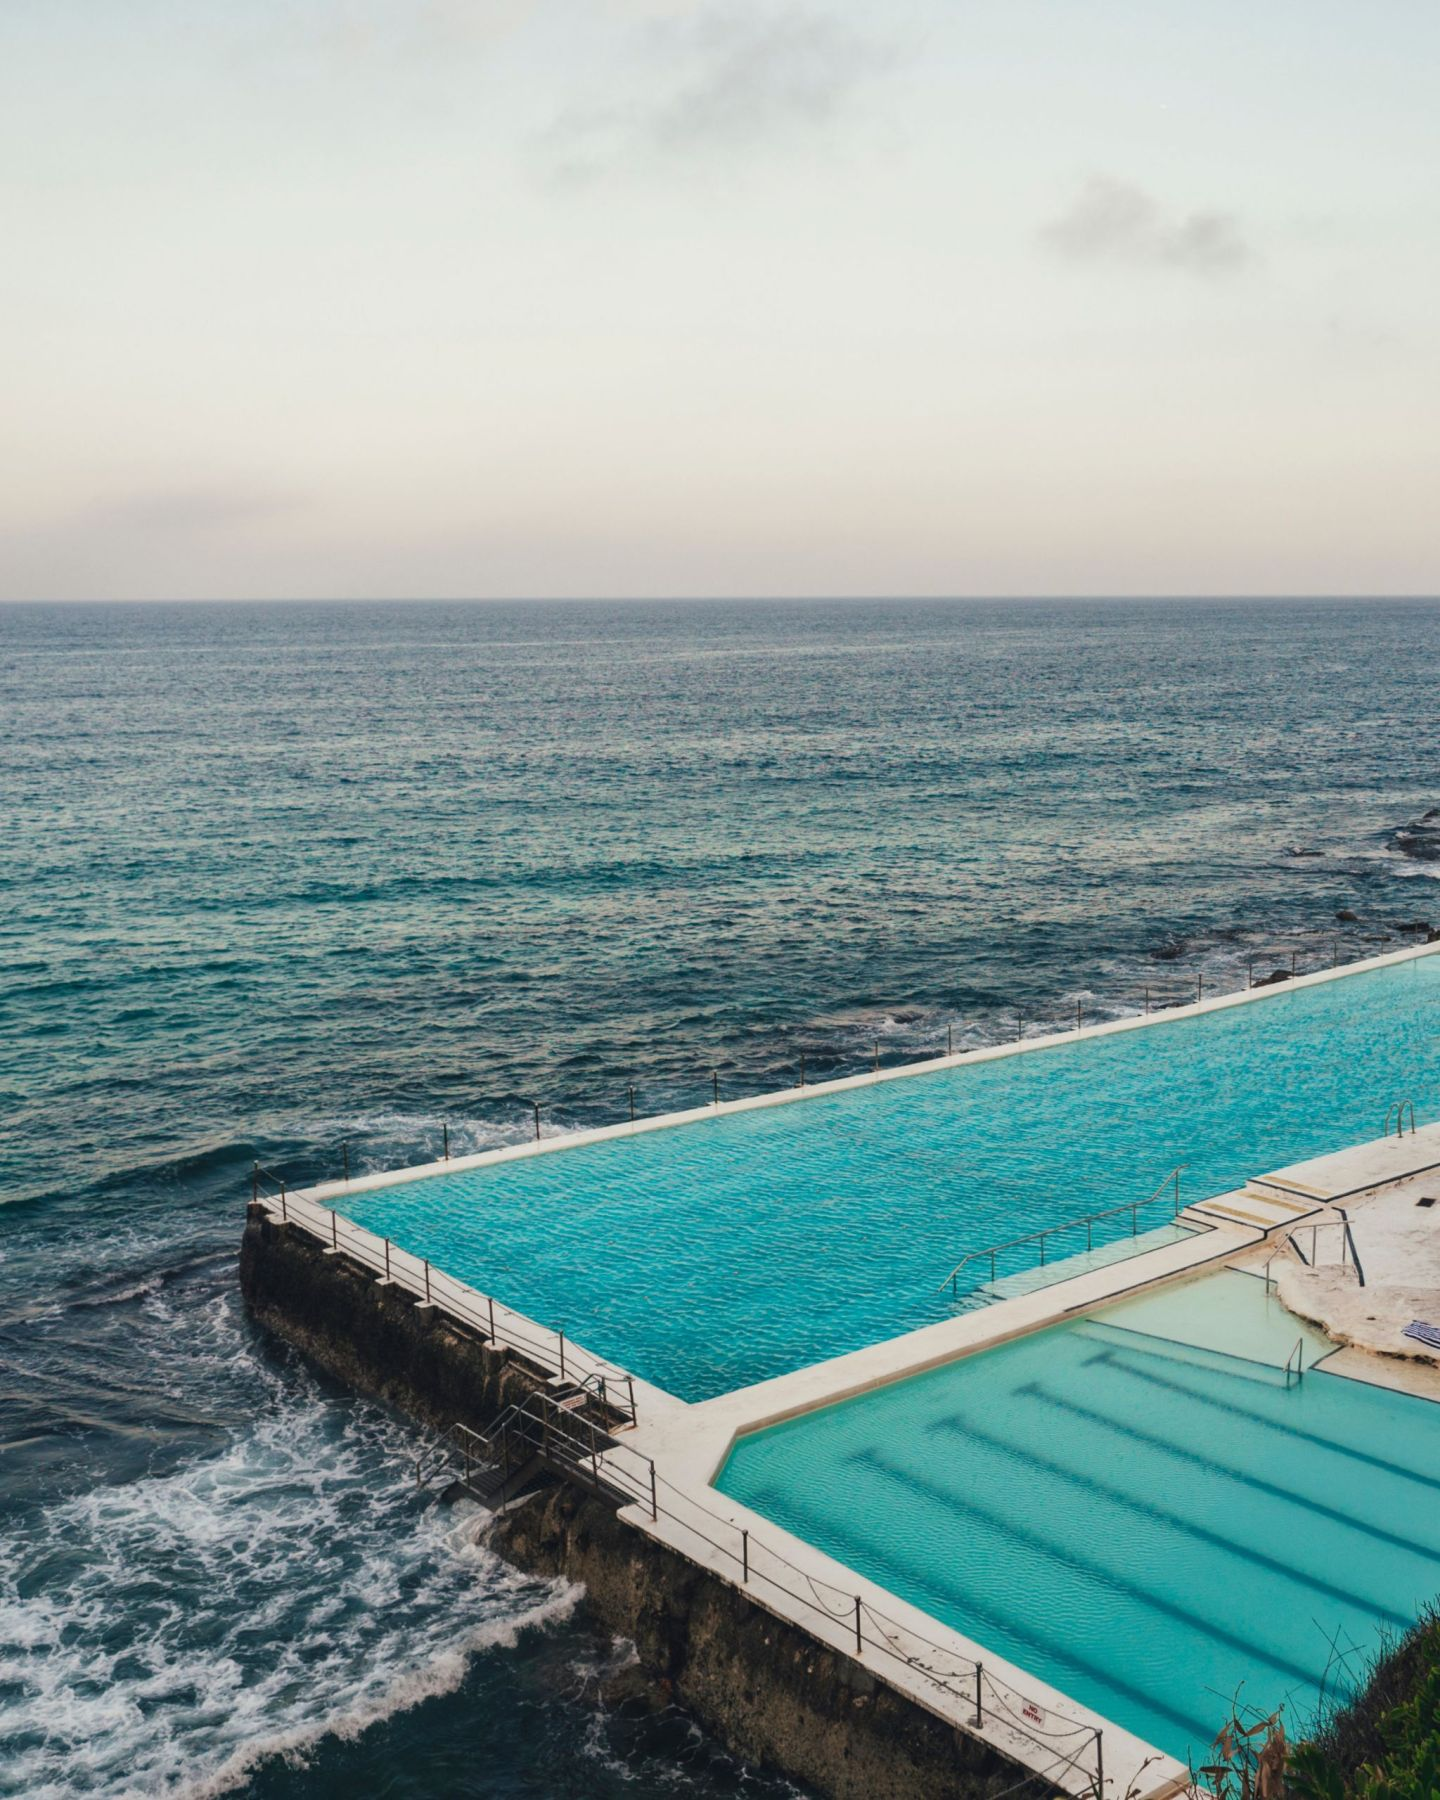 World's best swimming pools: Bondi Icebergs, Sydney